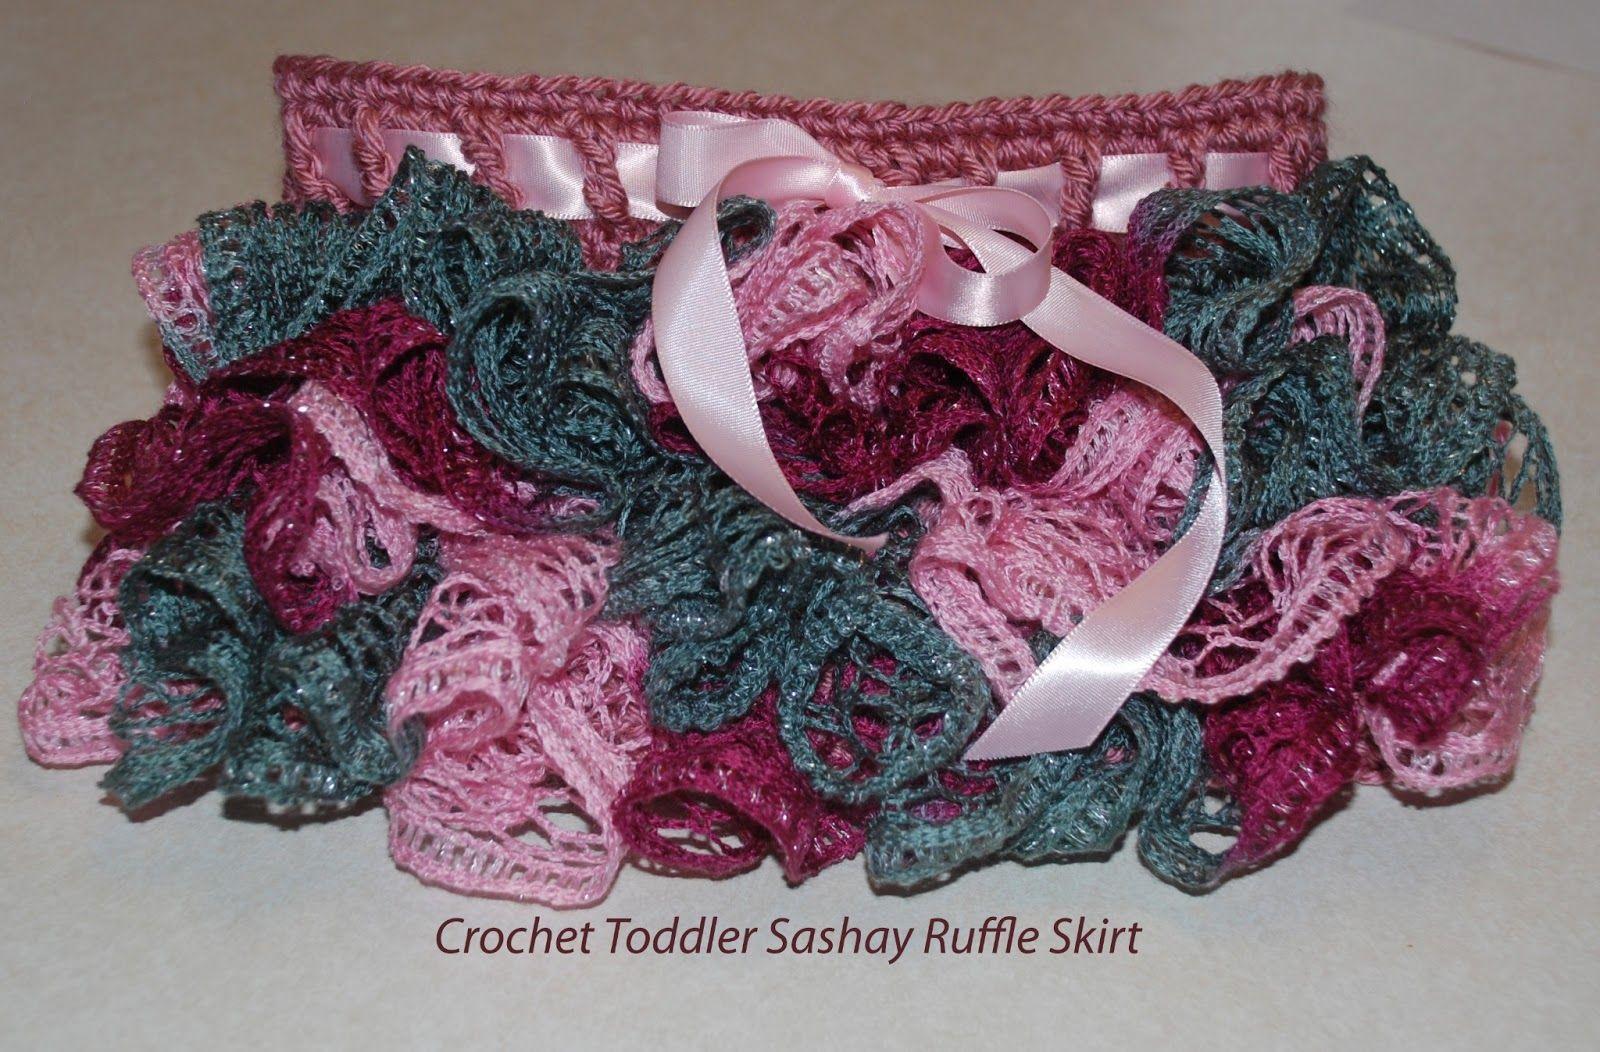 Amys crochet creative creations crochet sashay ruffle toddler amys crochet creative creations crochet sashay ruffle toddler skirt dt1010fo